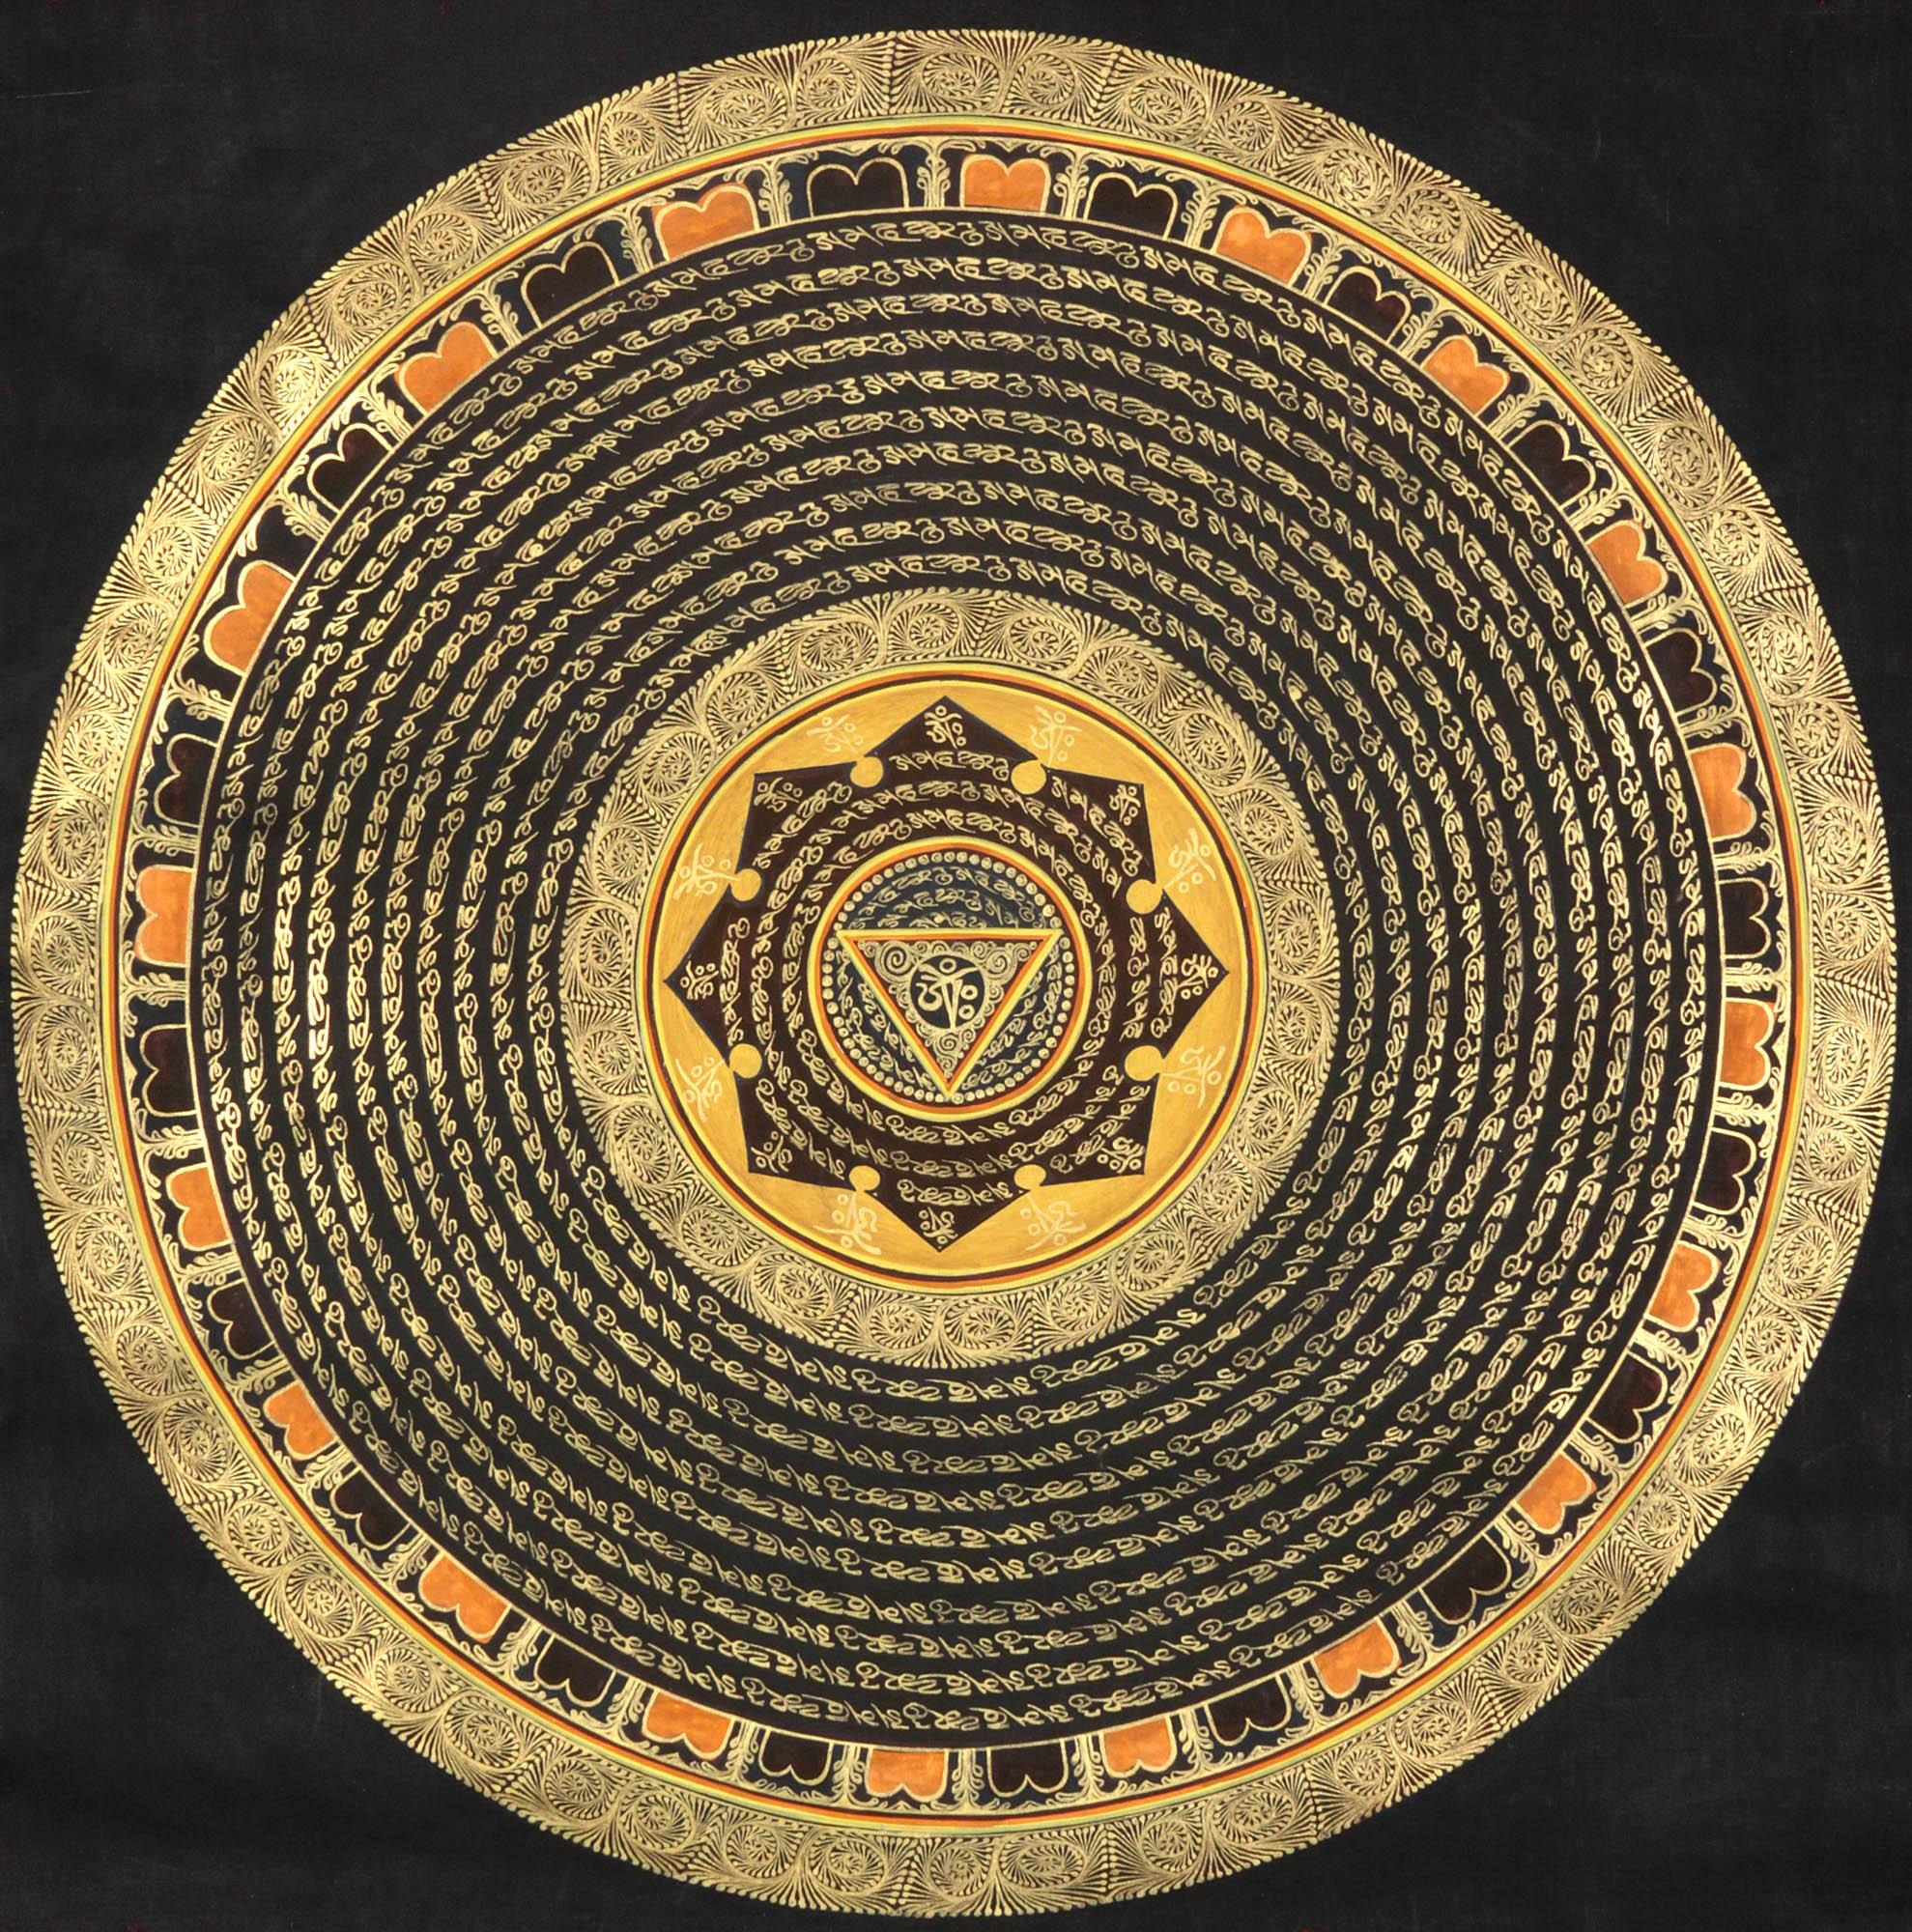 OM (AUM) Yoni Mandala With Auspicious Mantras